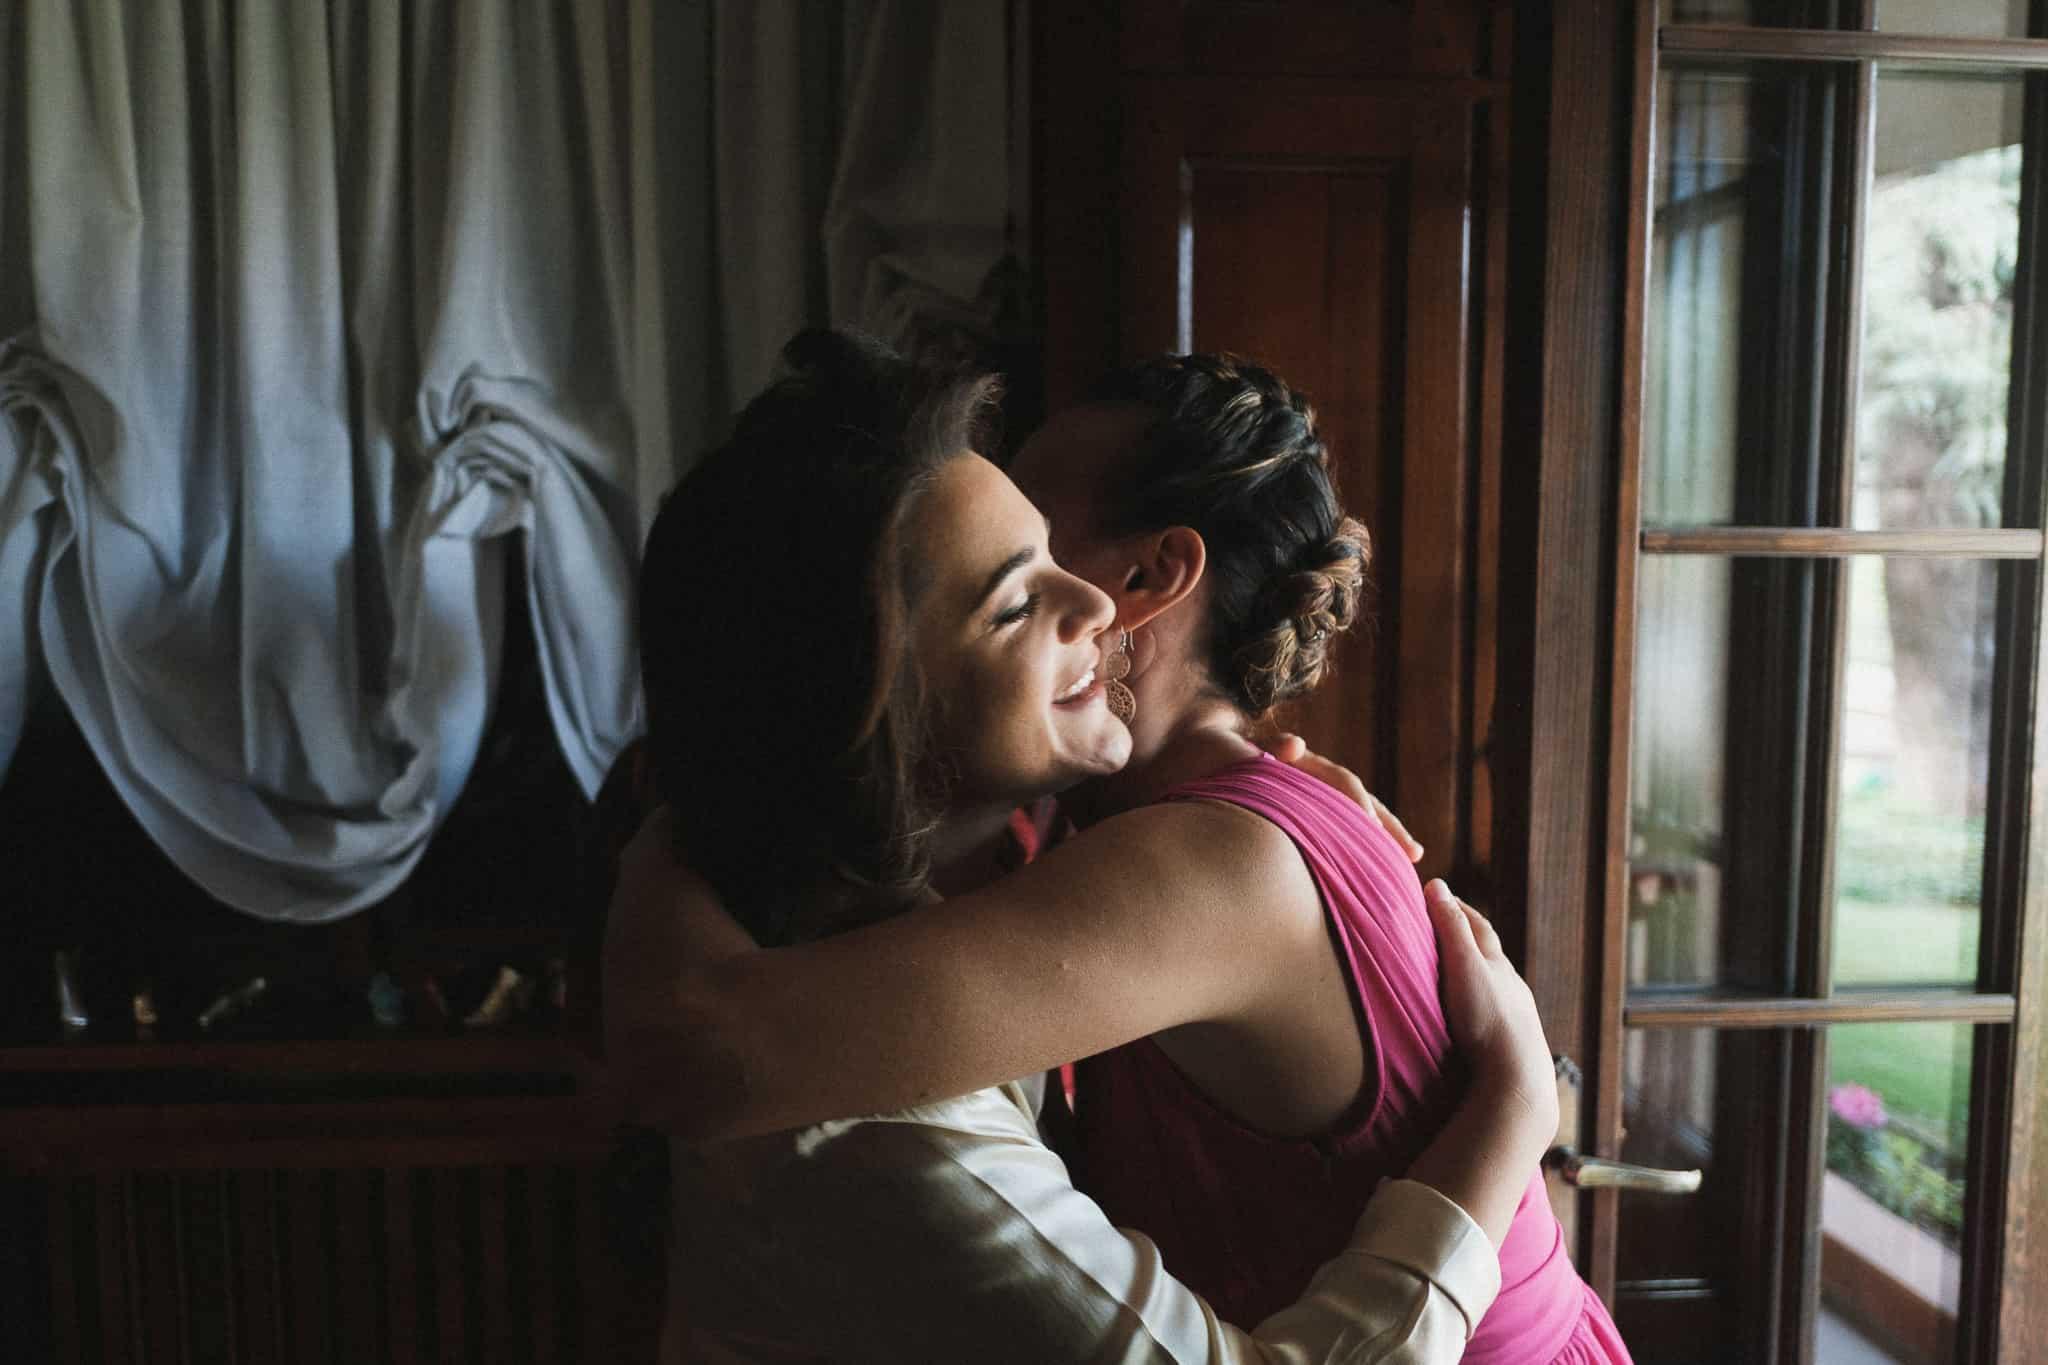 fotografo matrimonio reportage fondo brugarolo 0018